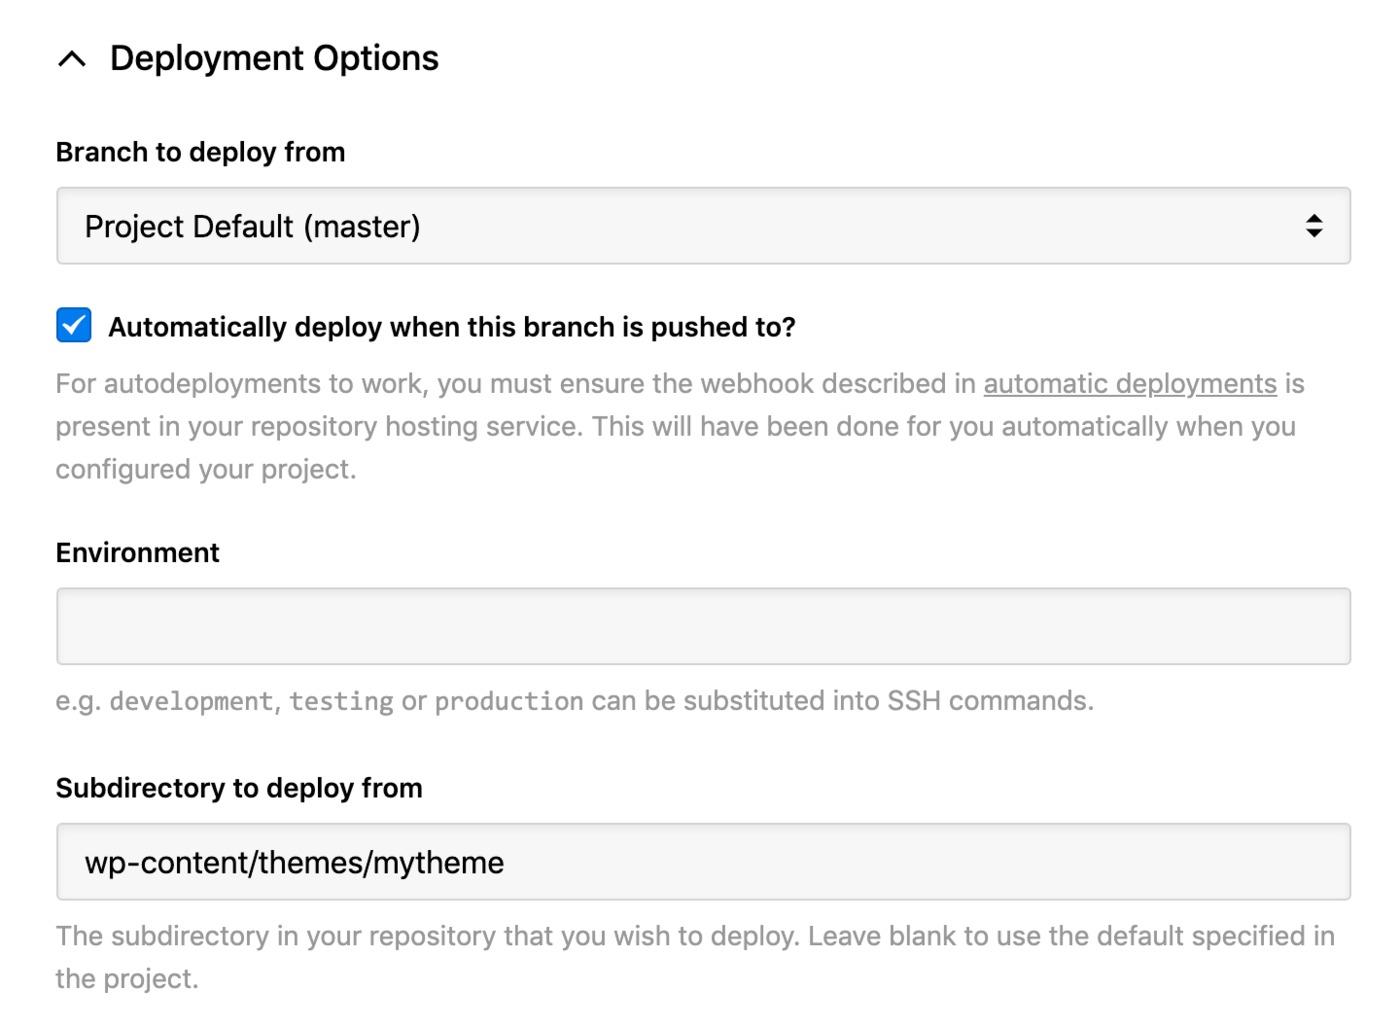 bluehost - deployment options